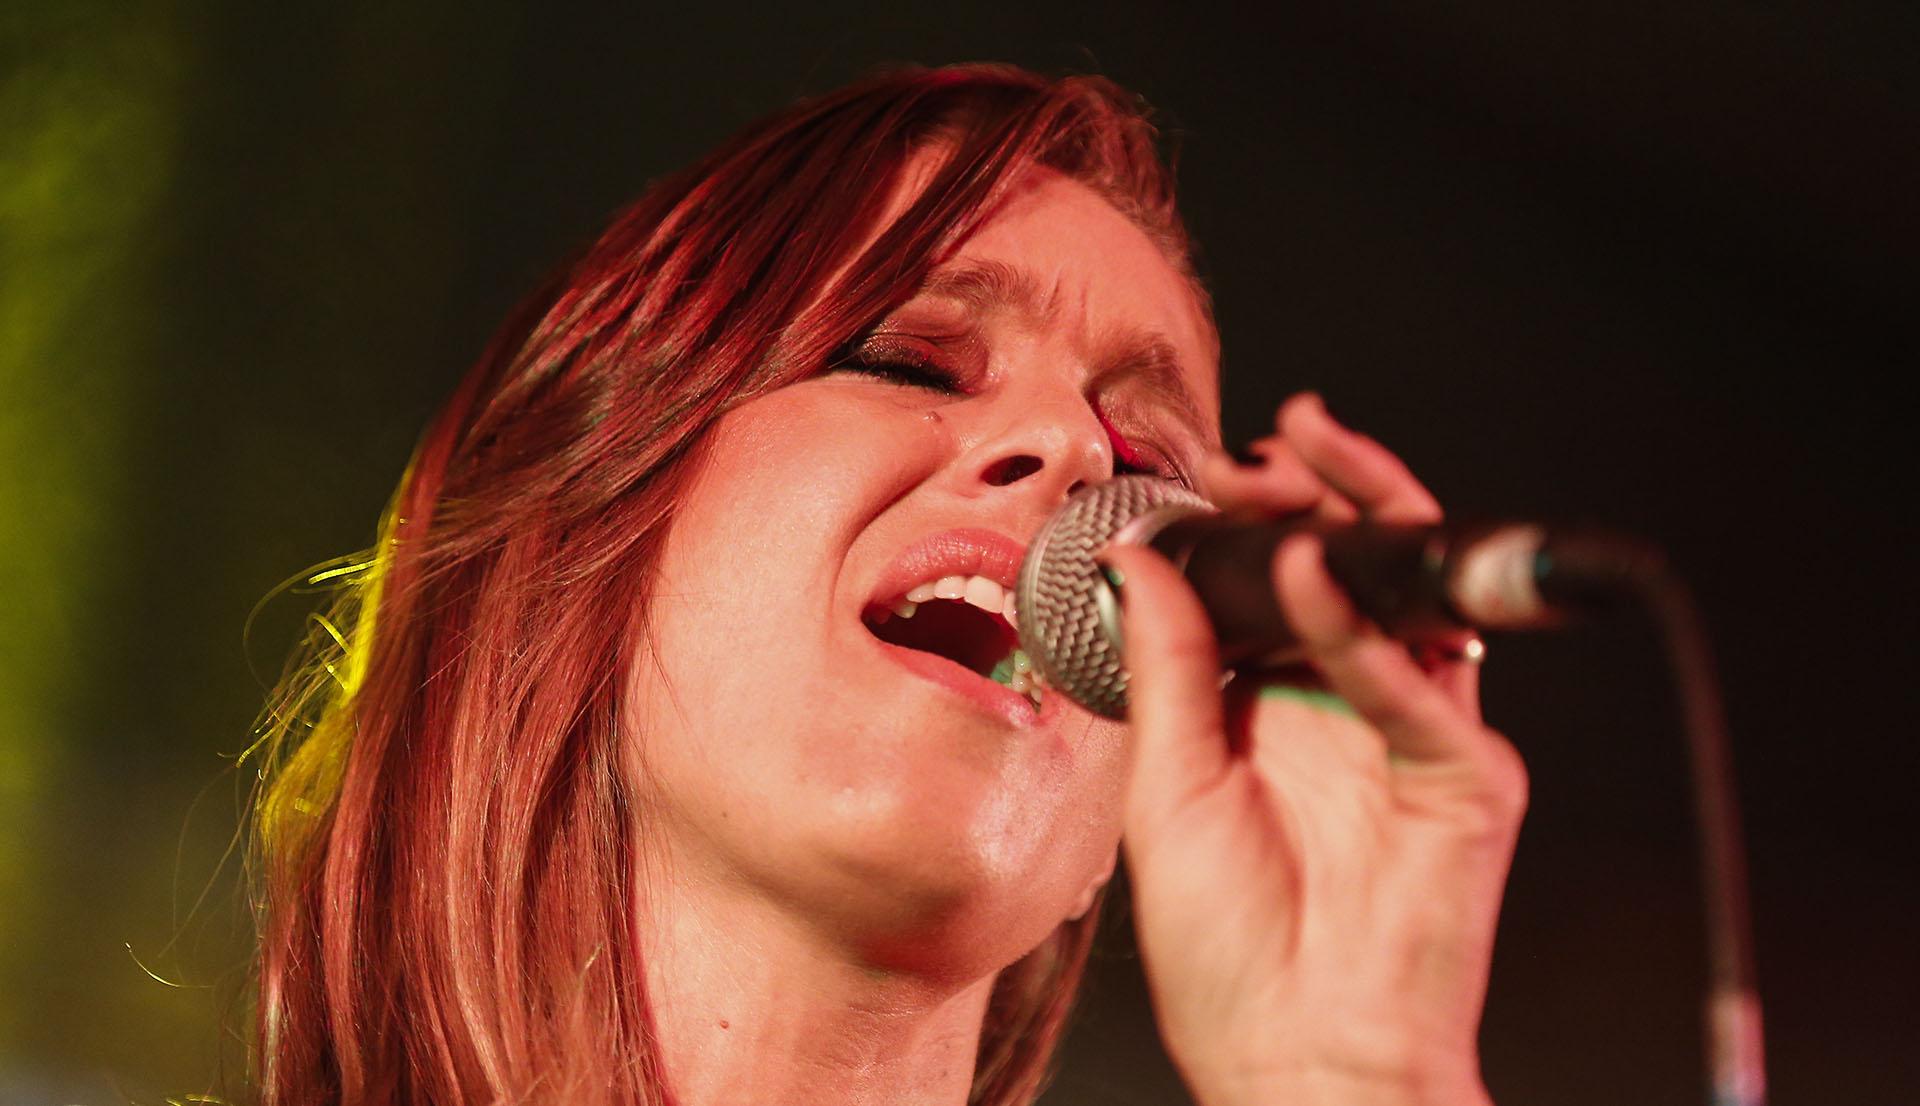 Geraldine Neumann en pleno show